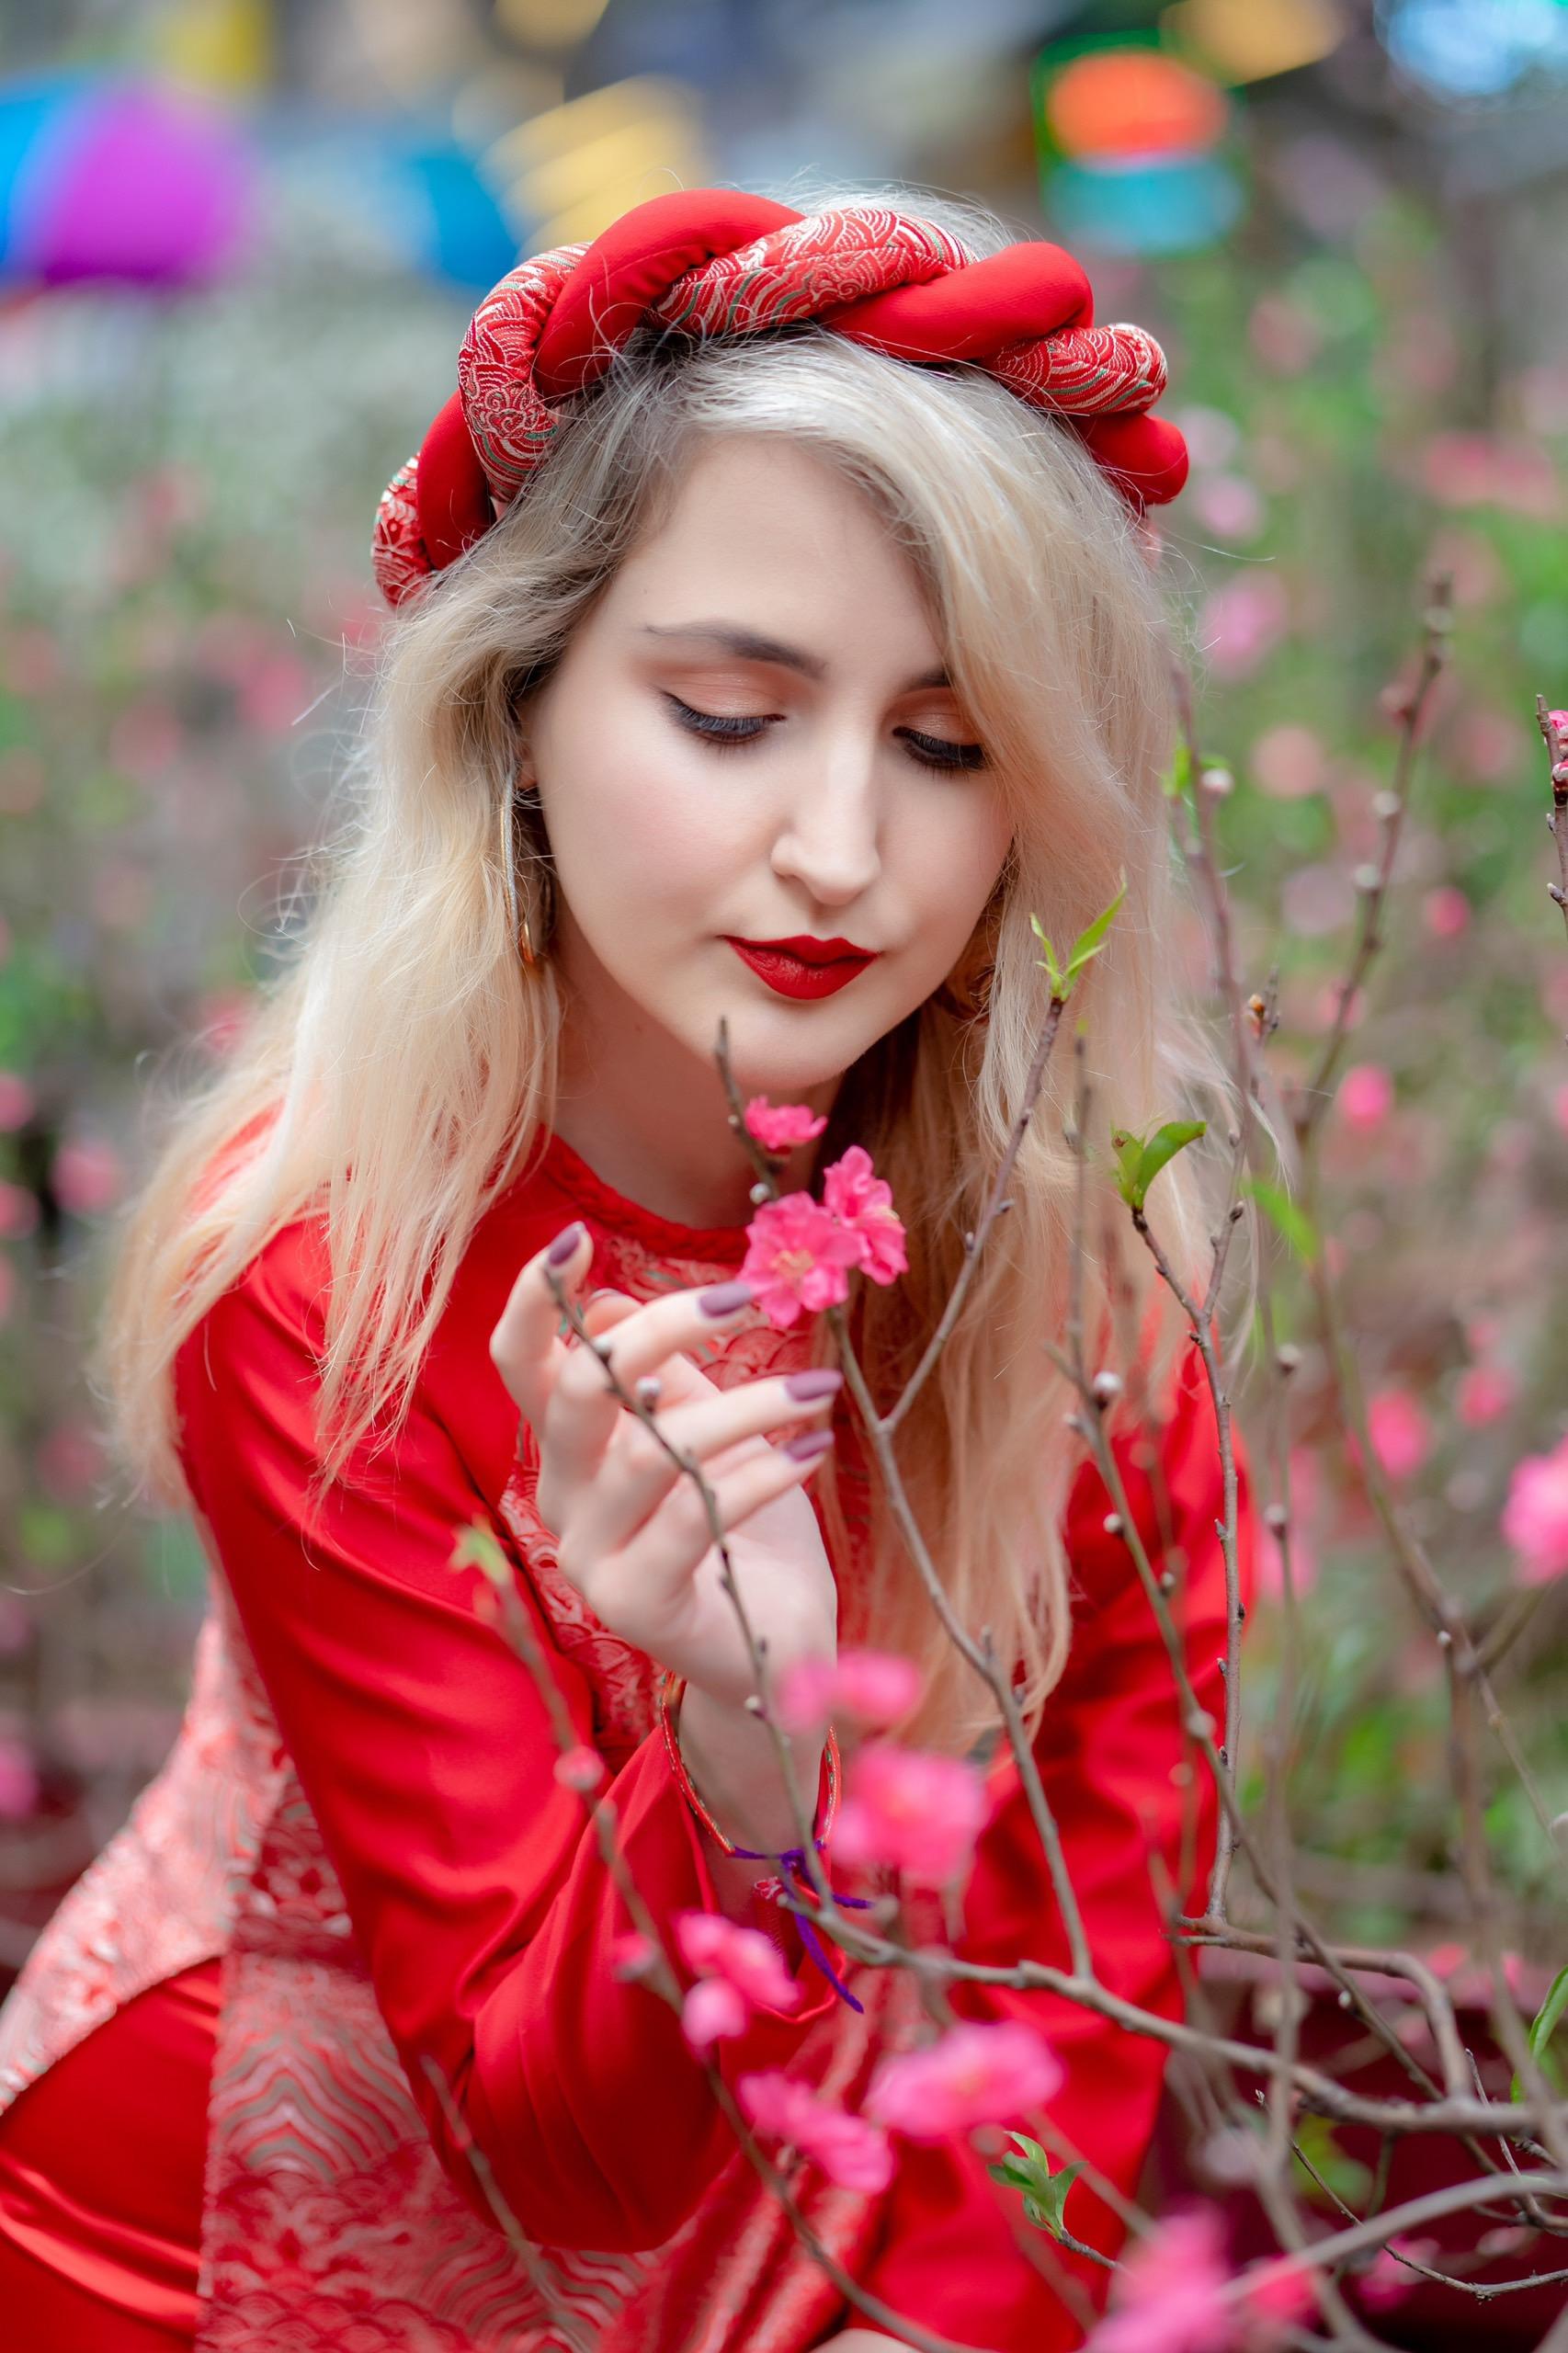 Dajana Hoxhaj wears ao dai (Vietnamese traditional costume) and poses with cherry blossoms, the flower symbolizing Tet (Vietnamese Lunar New year) in northern Vietnam. Photo by courtesy of Dajana Hoxhaj